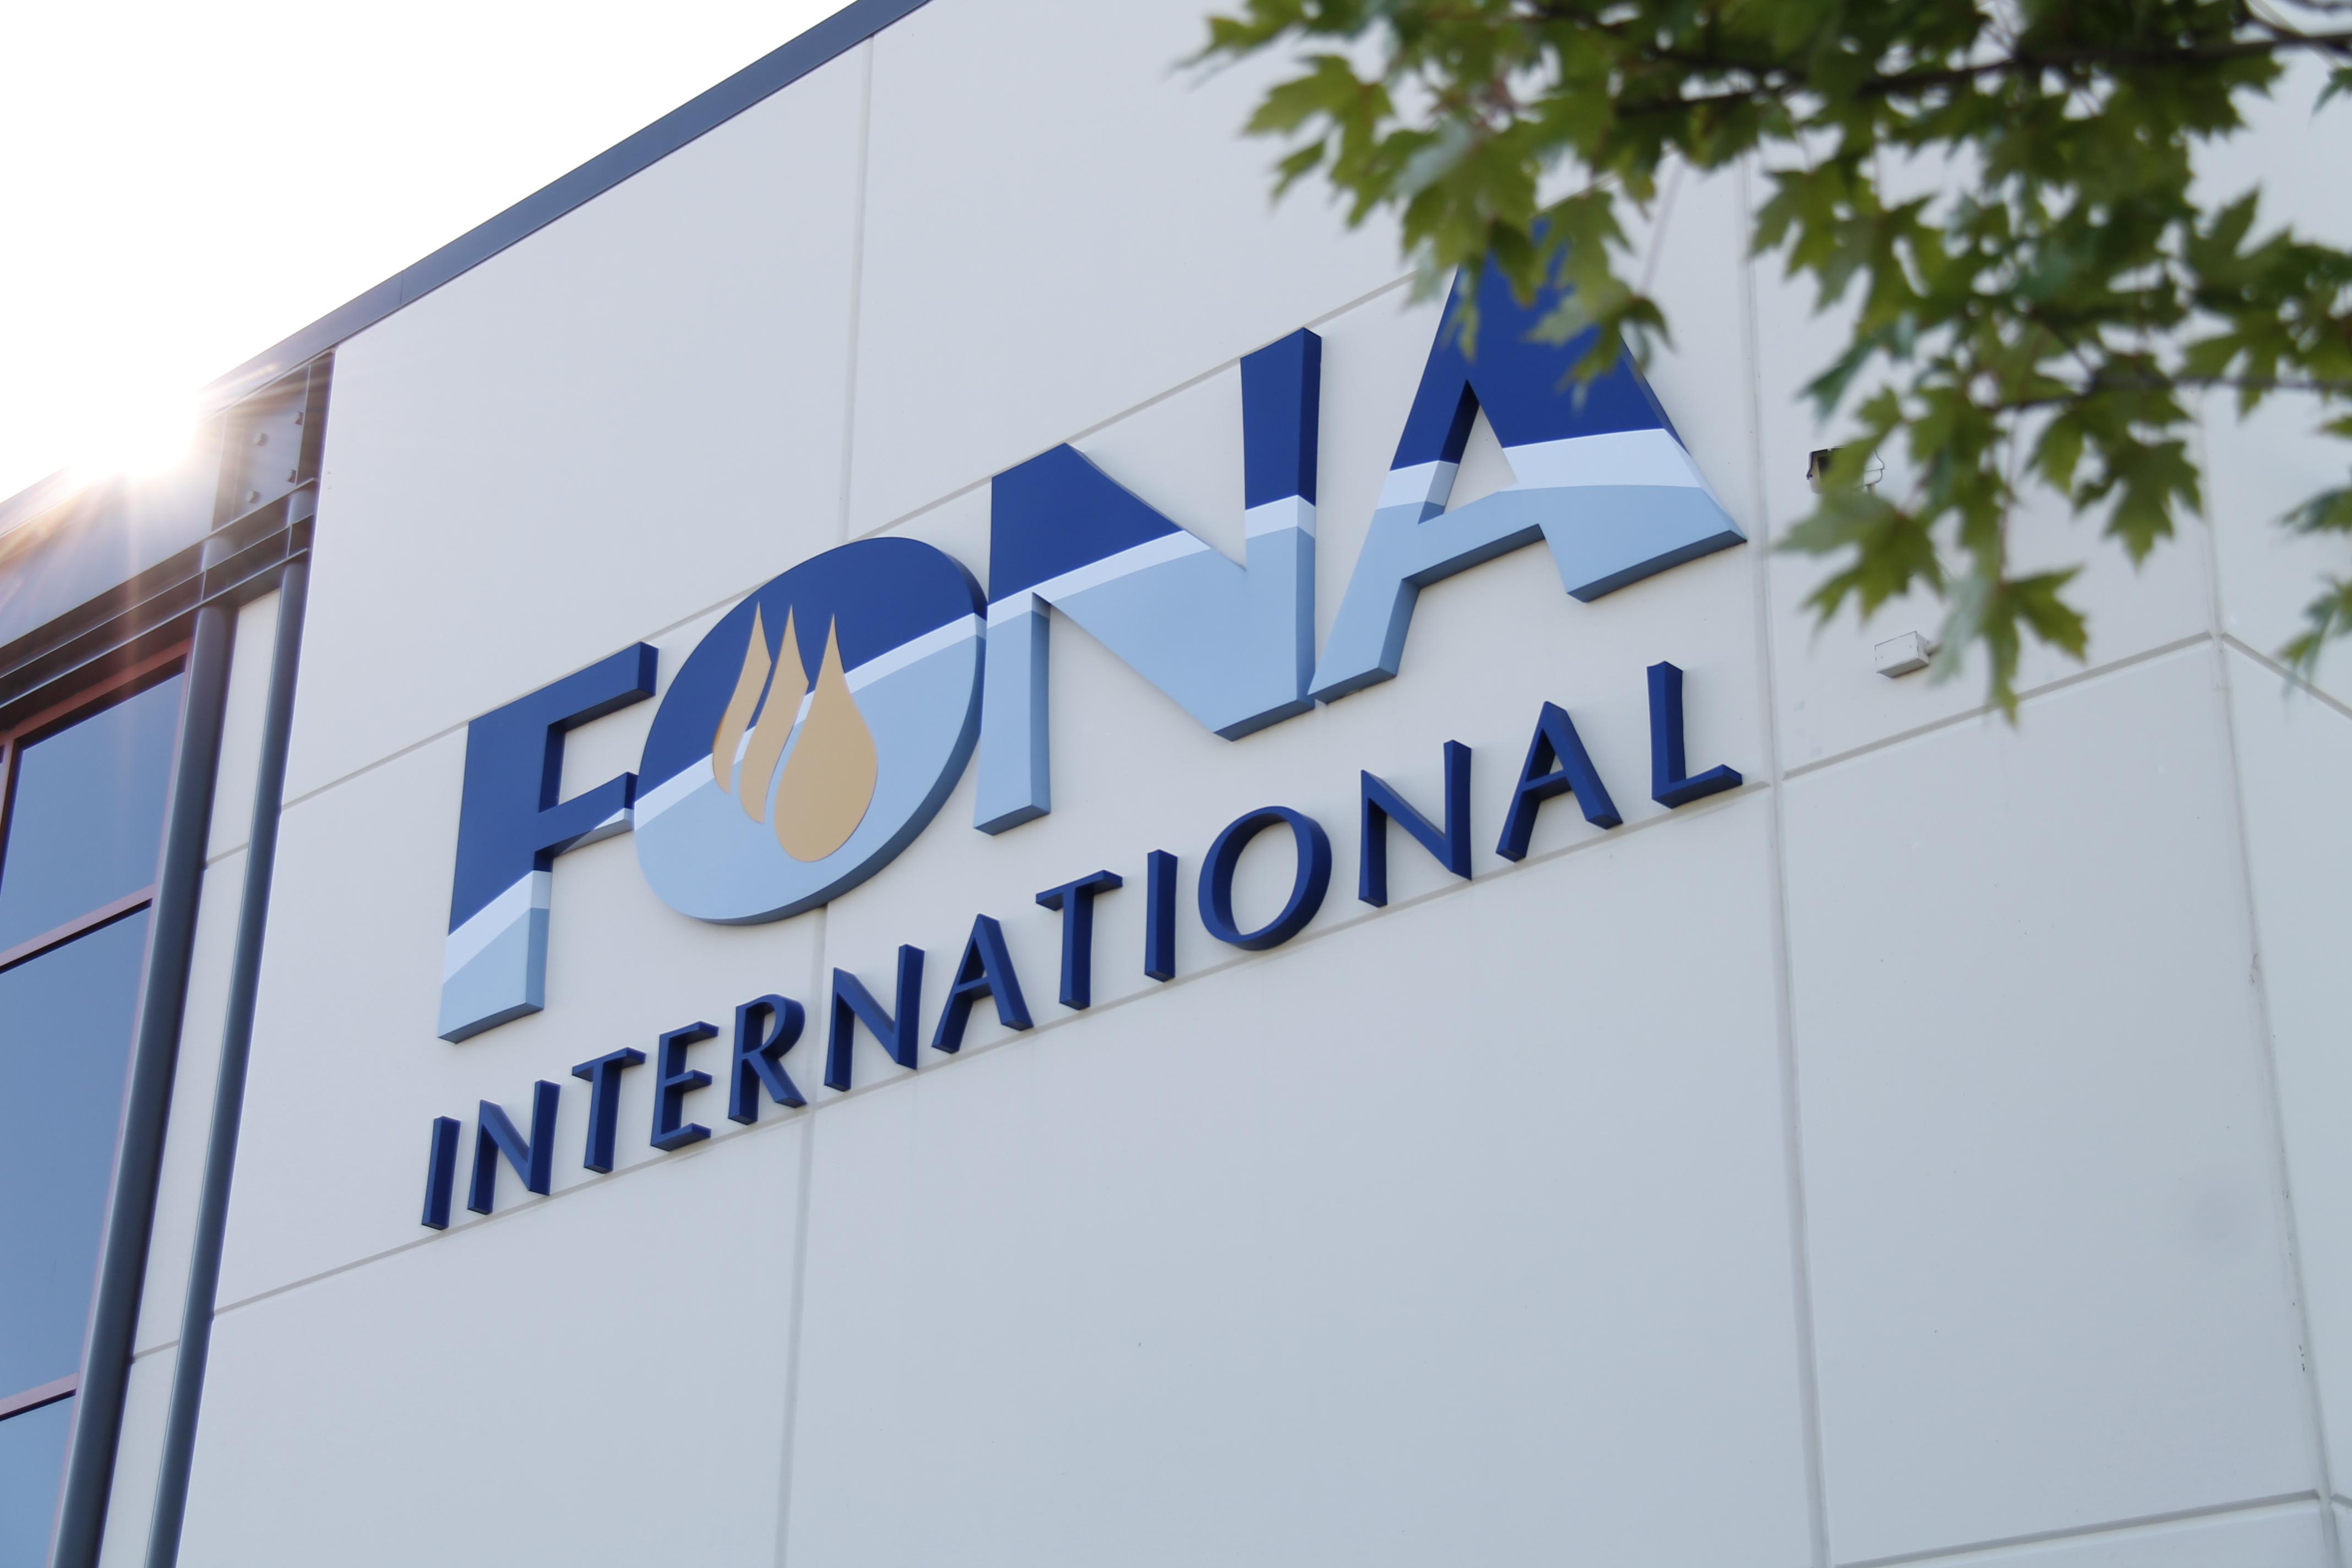 FONA Wins 2016 Food Quality & Safety Award - Food Quality